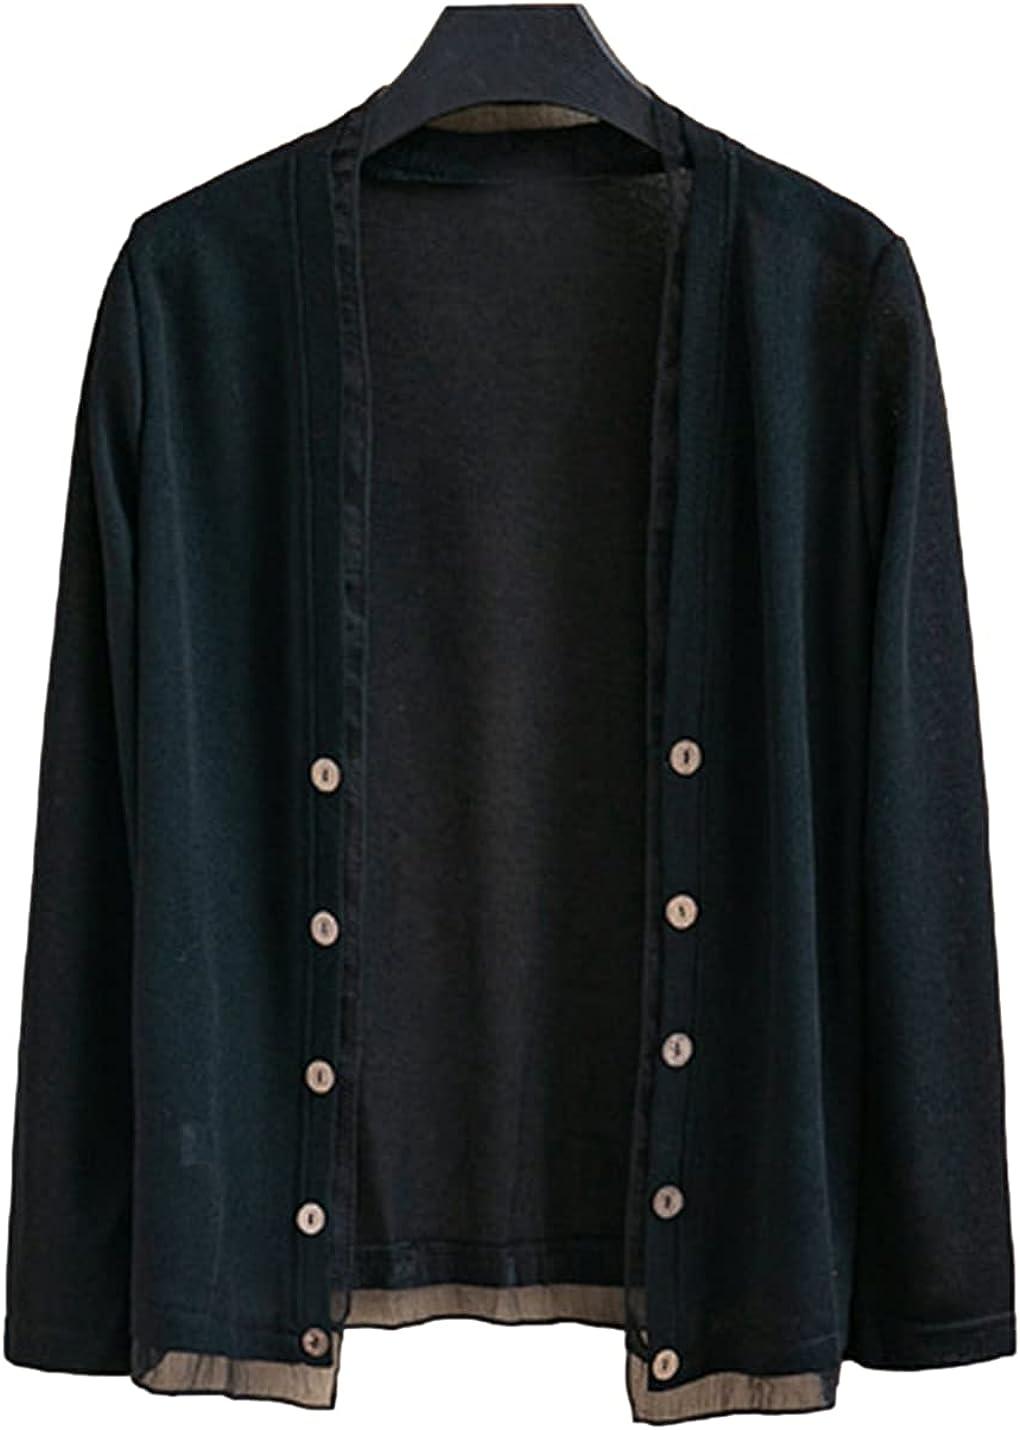 FindThy Women's Long Sleeve Fake Cardigan Layer Free Shipping Cheap Virginia Beach Mall Bargain Gift Shee Double